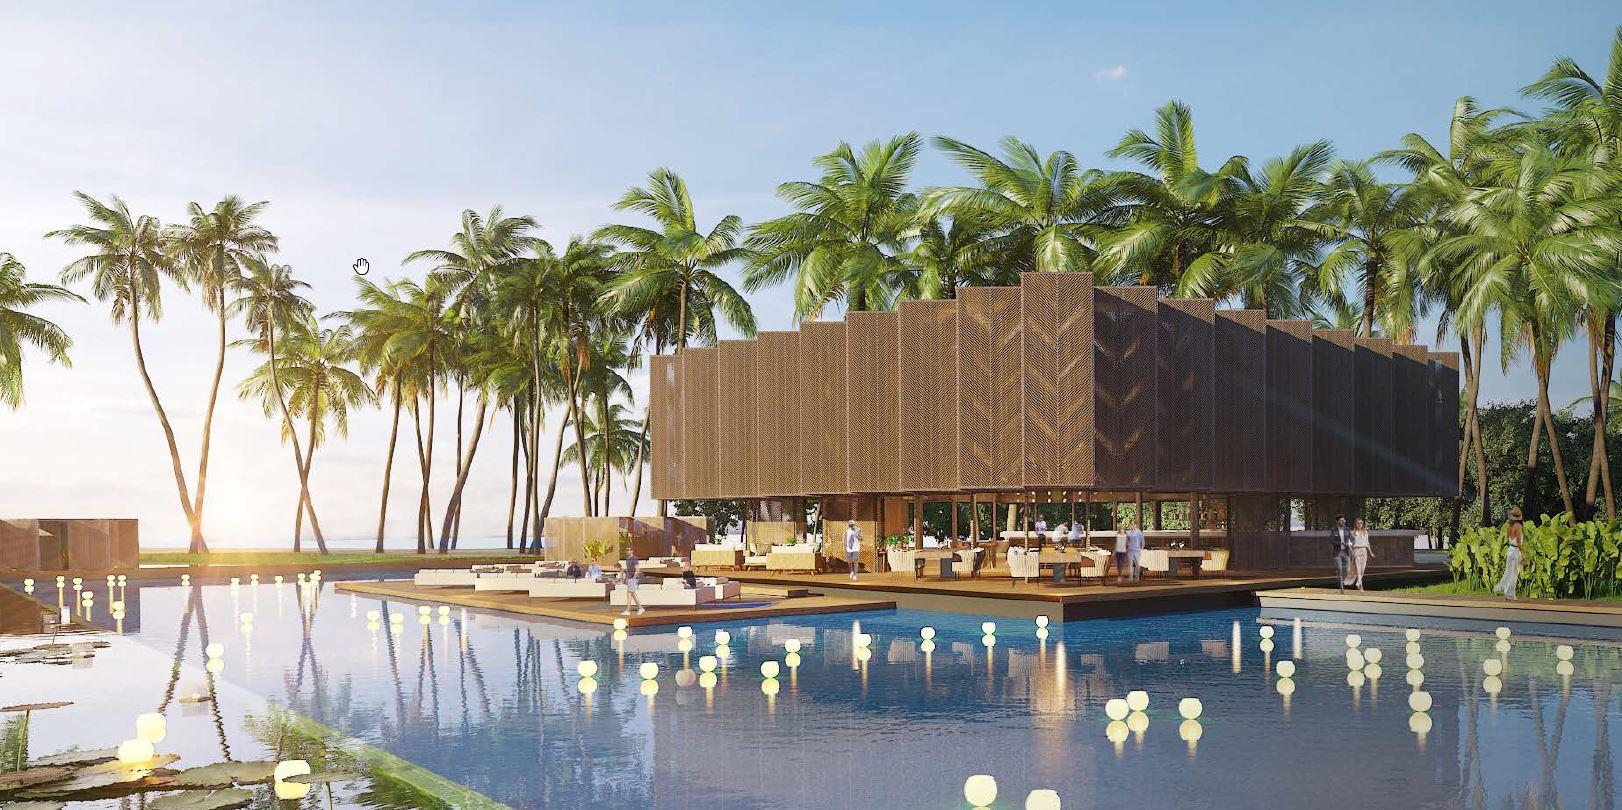 boydens-PHU HAI HOTEL & RESORT